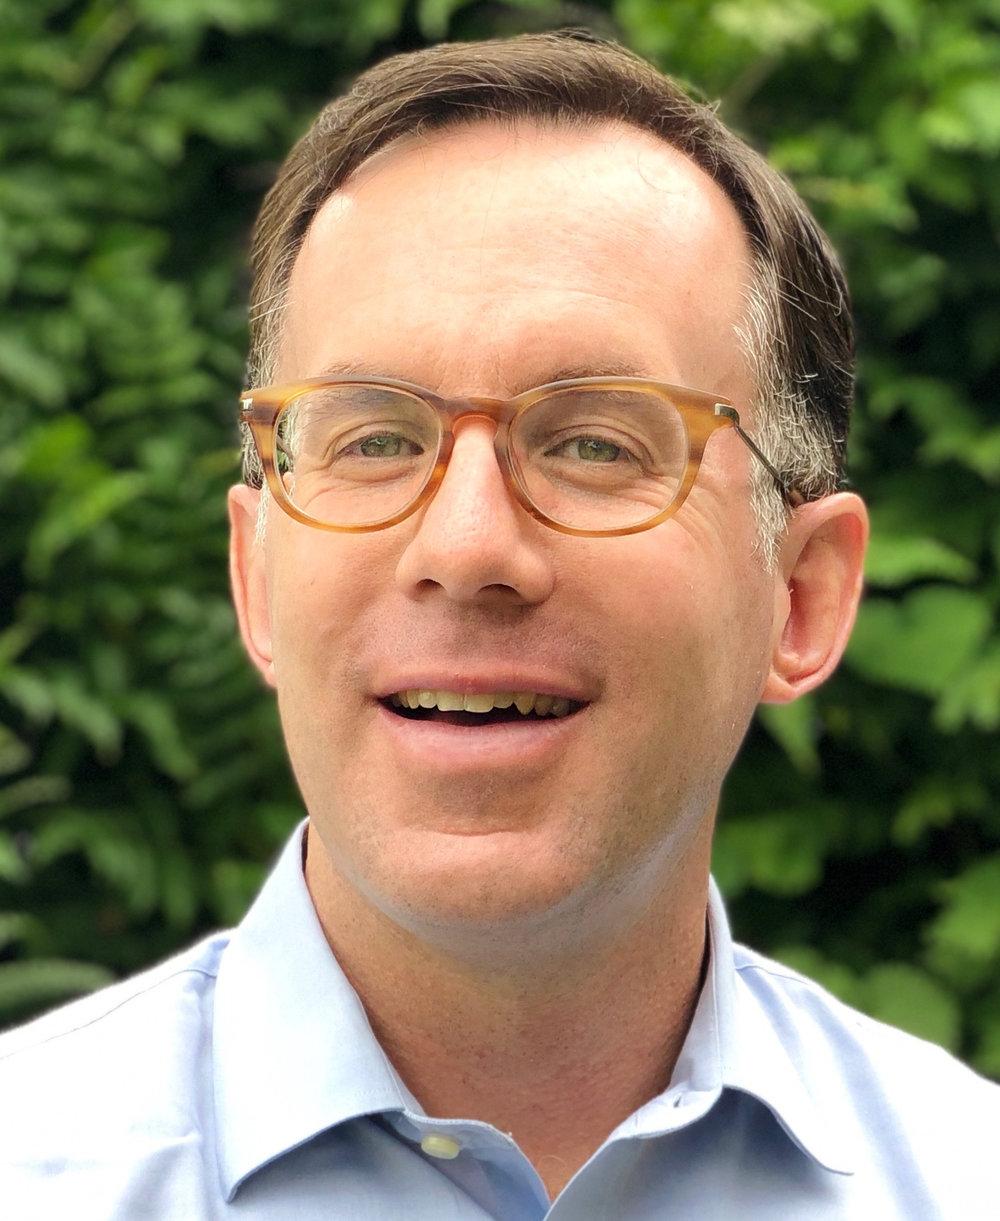 Charles King Sadler, ASLA, ISA Principle | Design Director   ISA Certified Arborist #NY-5950A  ISA Tree Risk Assessment Qualified